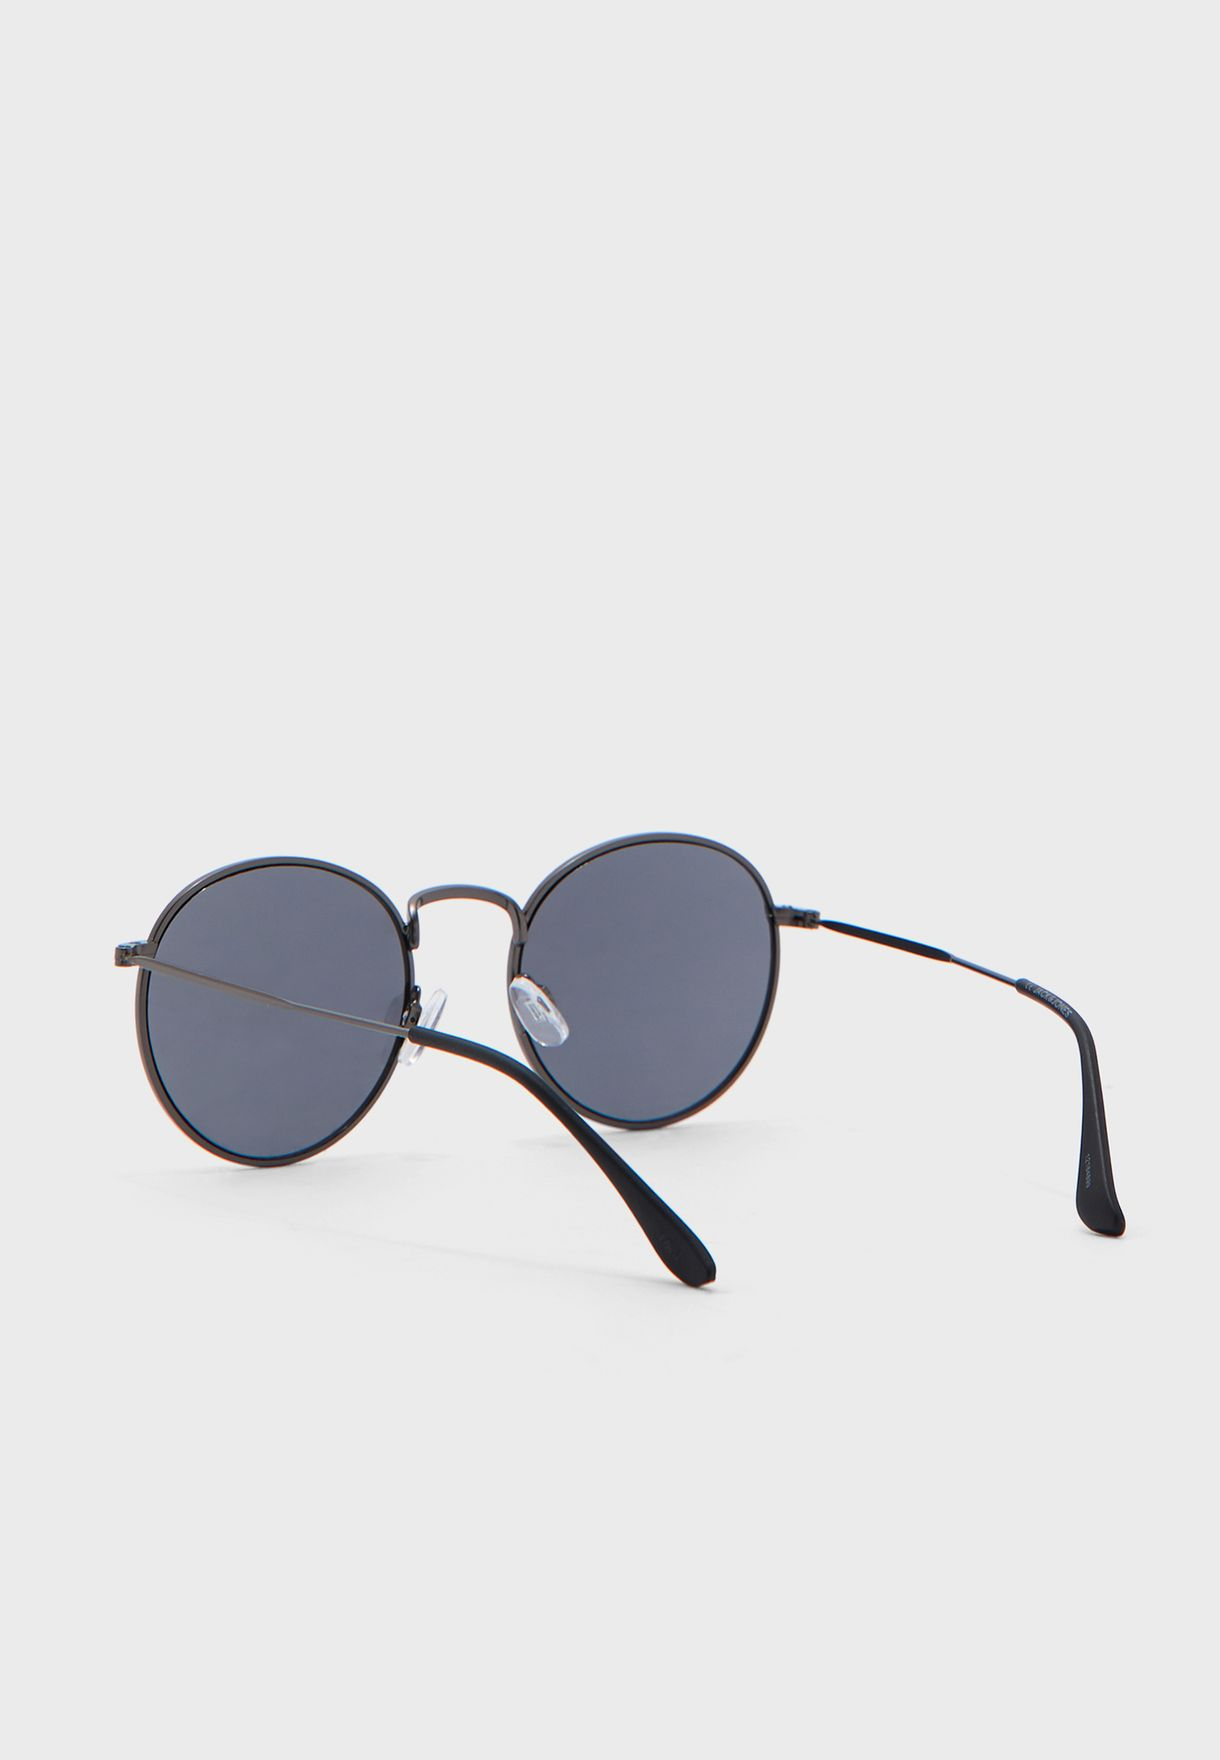 نظارة شمسية رايدر بإطار معدني